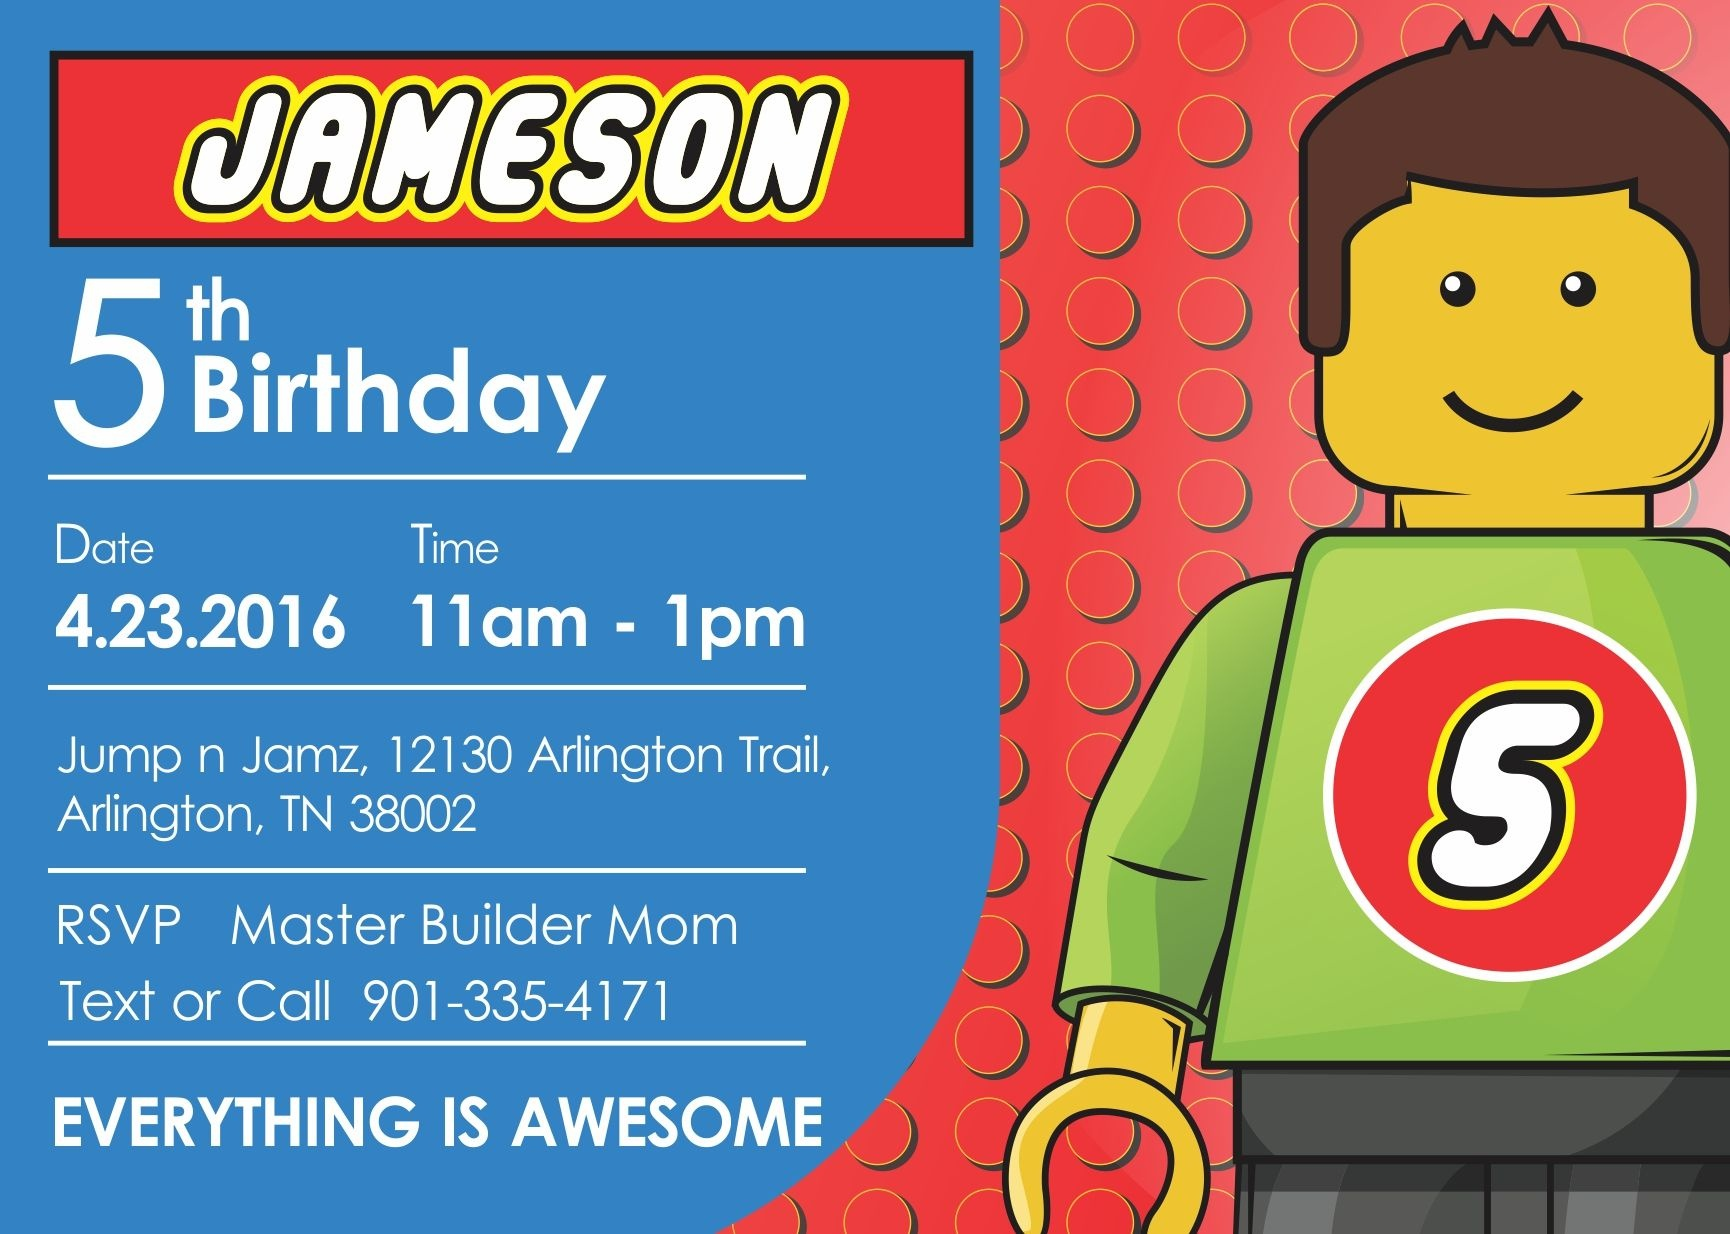 Free Lego Birthday Invitations For Donny | Invitation Ideas Template - Lego Party Invitations Printable Free